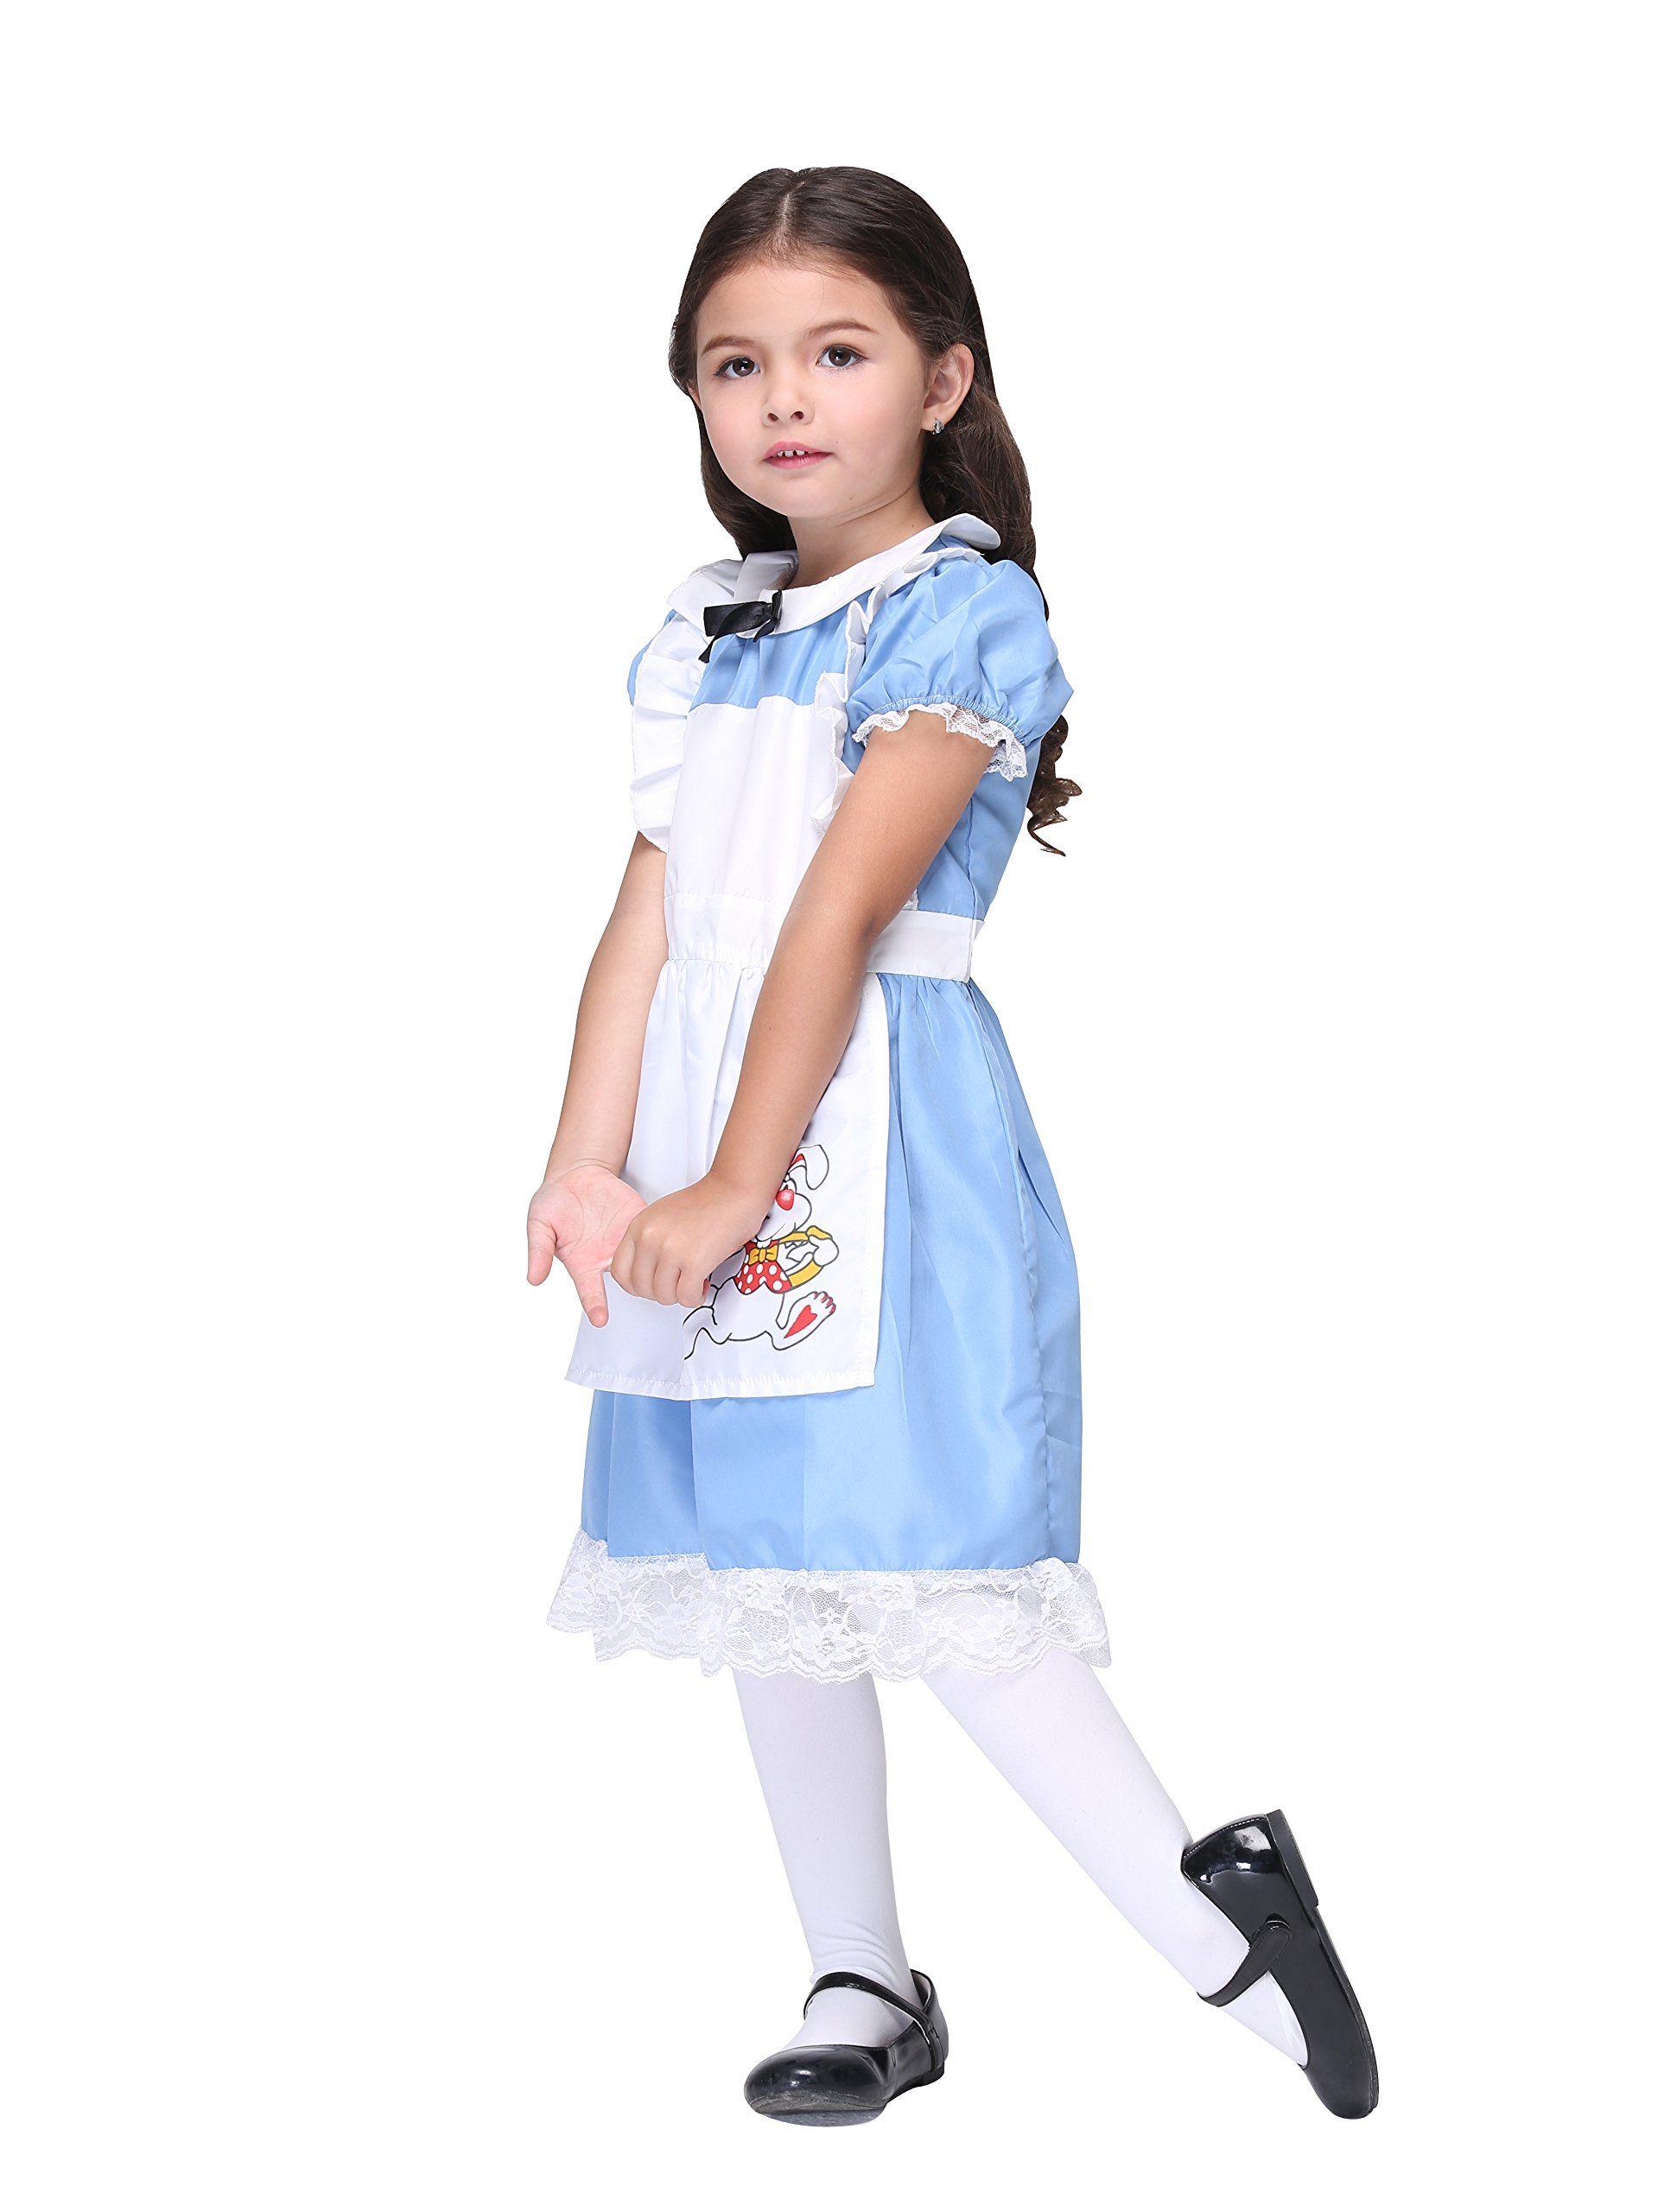 22d3eef74b99 Vivihoo EK027 Lil Alice in Wonderland Toddlers Costume Cosplay Dress For Little  Girl M >>> You can find more details by visiting the image link.